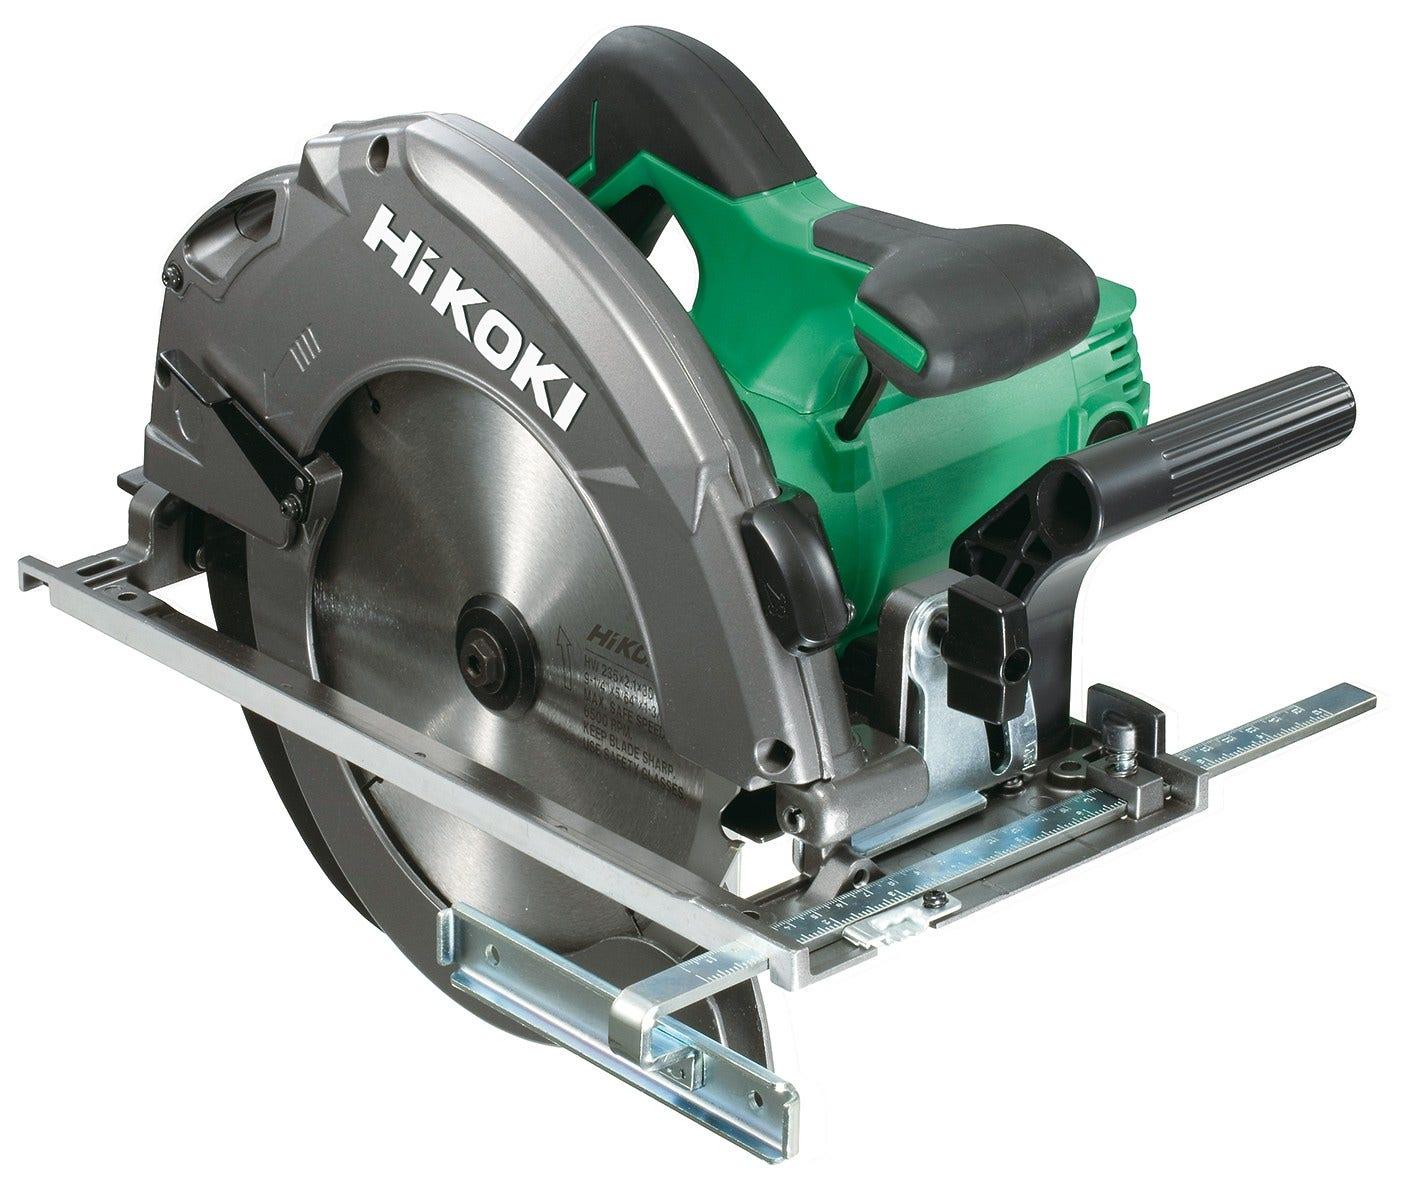 Hikoki Scie circulaire - lame Ø 235 mm - 86 mm - 2000 W